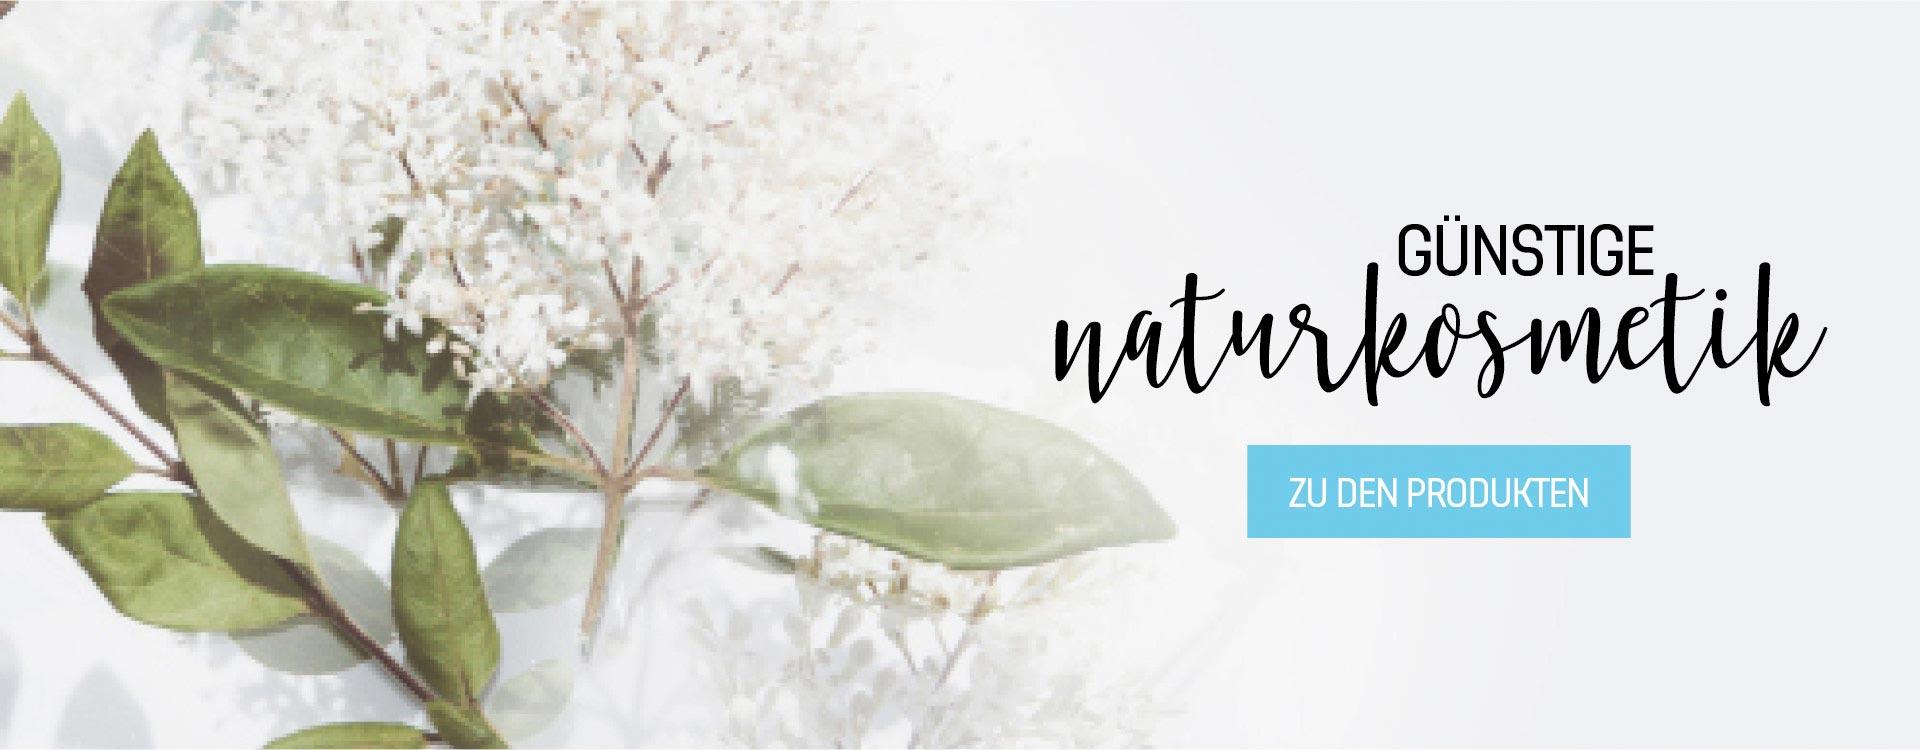 Günstige, zertifizierte Naturkosmetik ohne Tierversuche | cosa Kosmetik